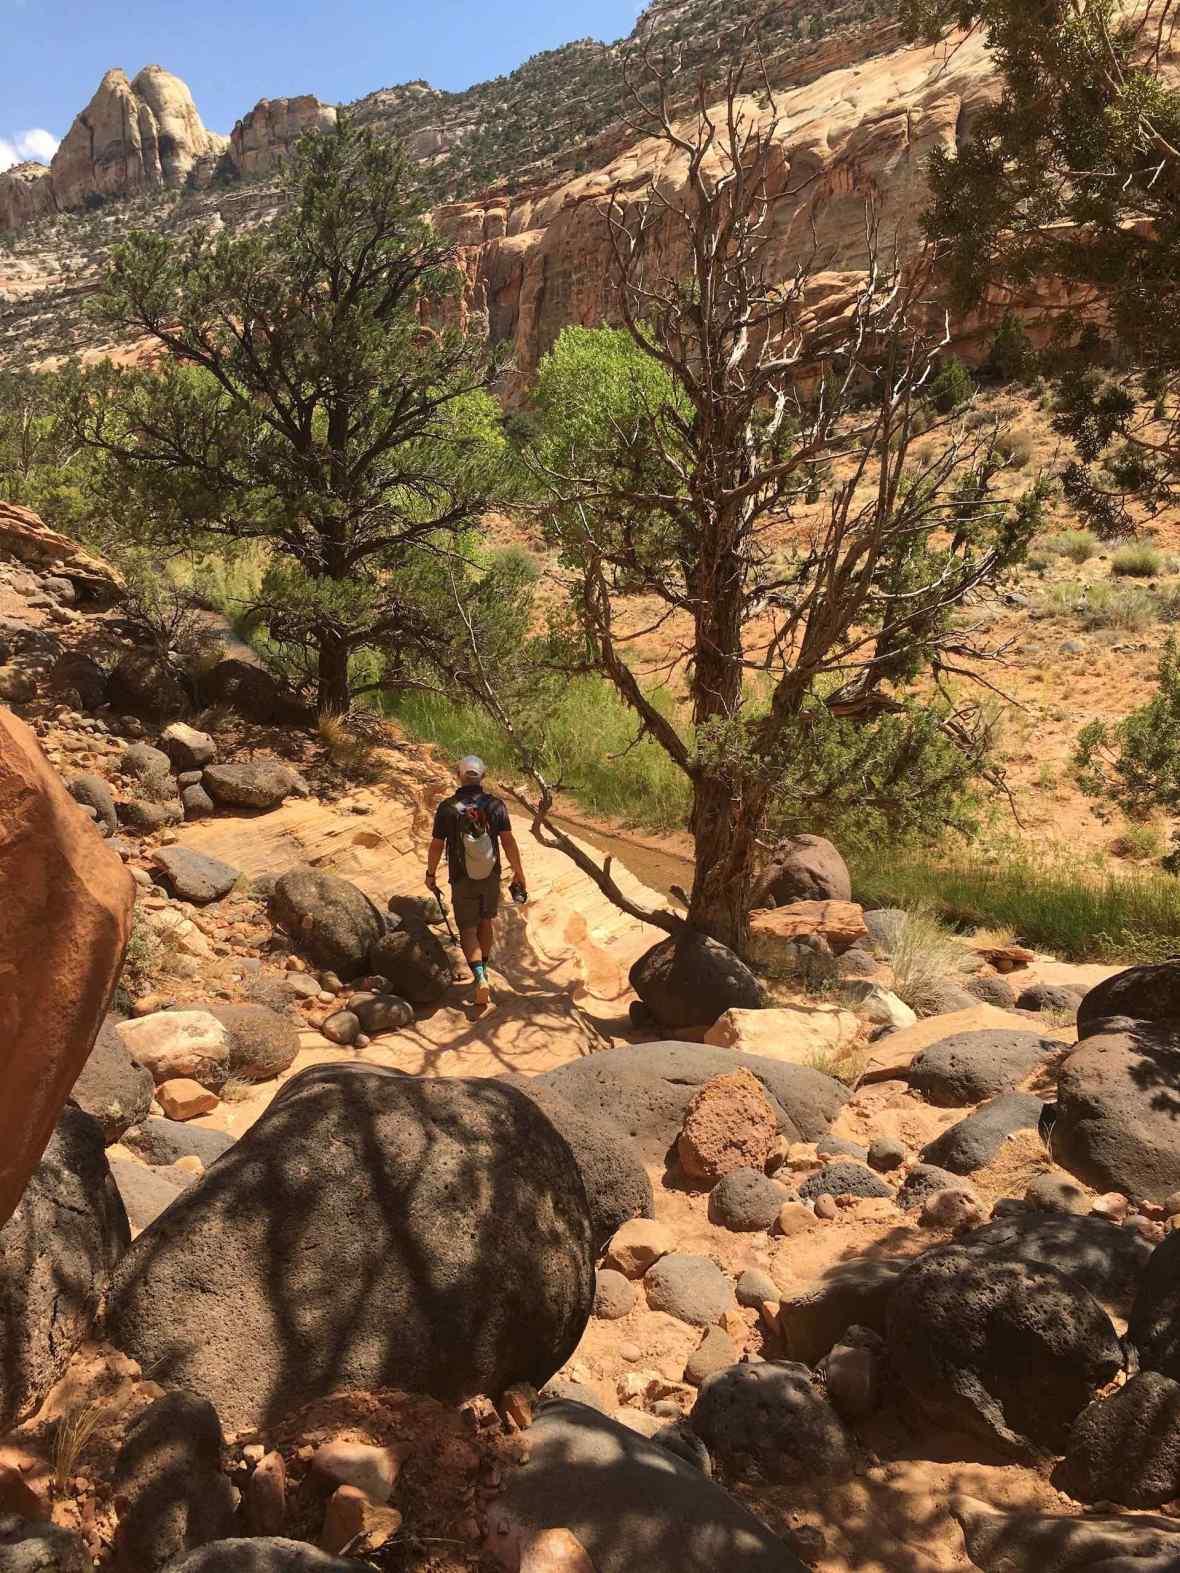 Boulder-strewn Pleasant Creek Trail in Capitol Reef National Park